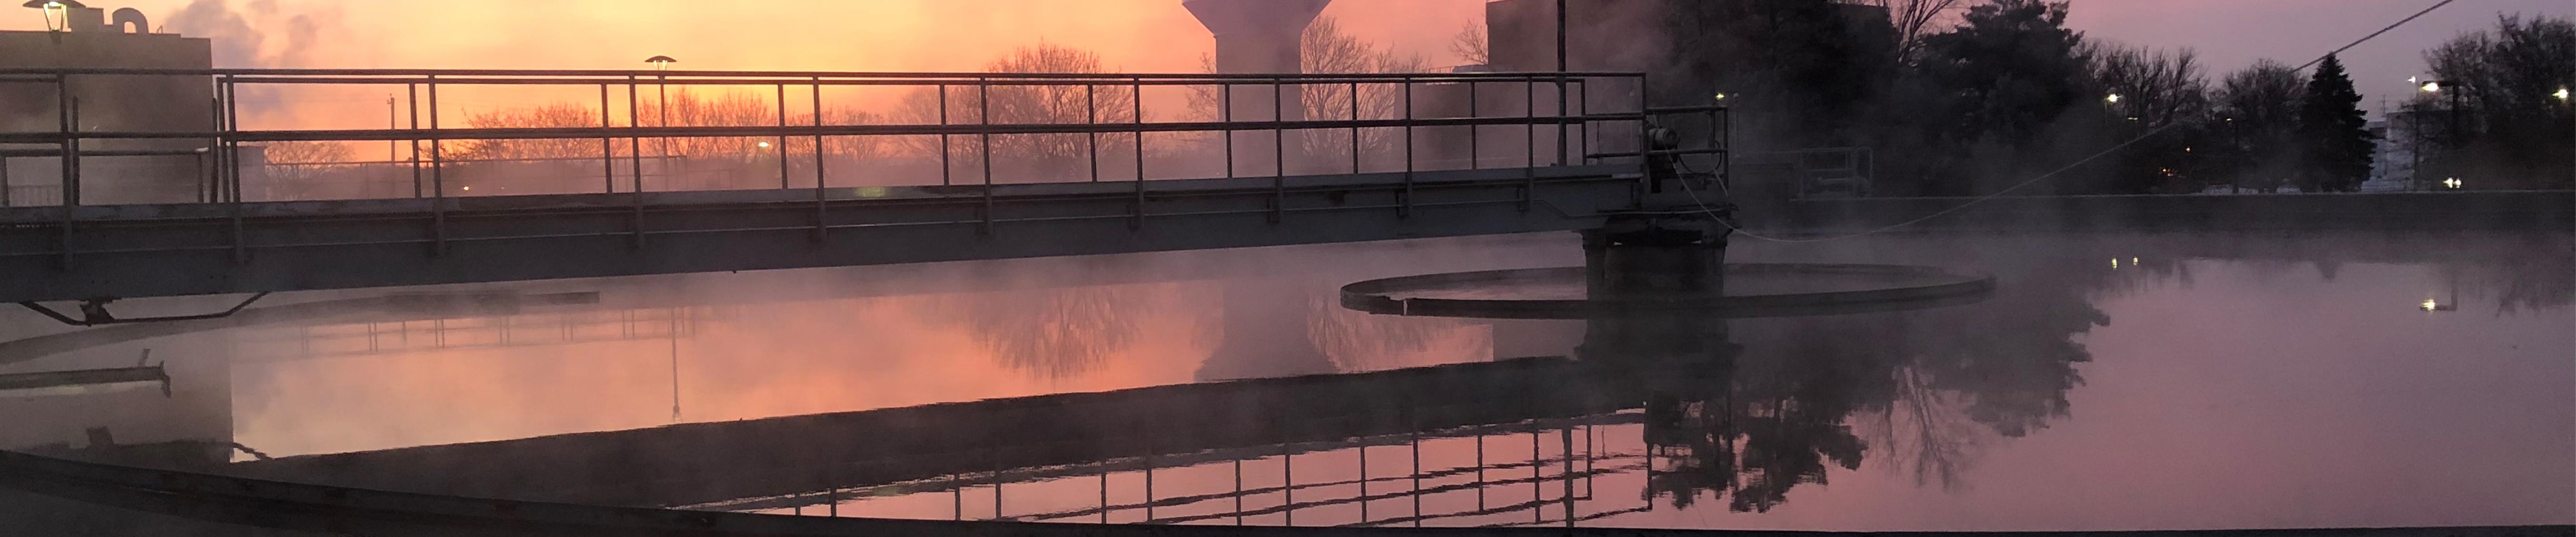 Sunrise on clarifiers